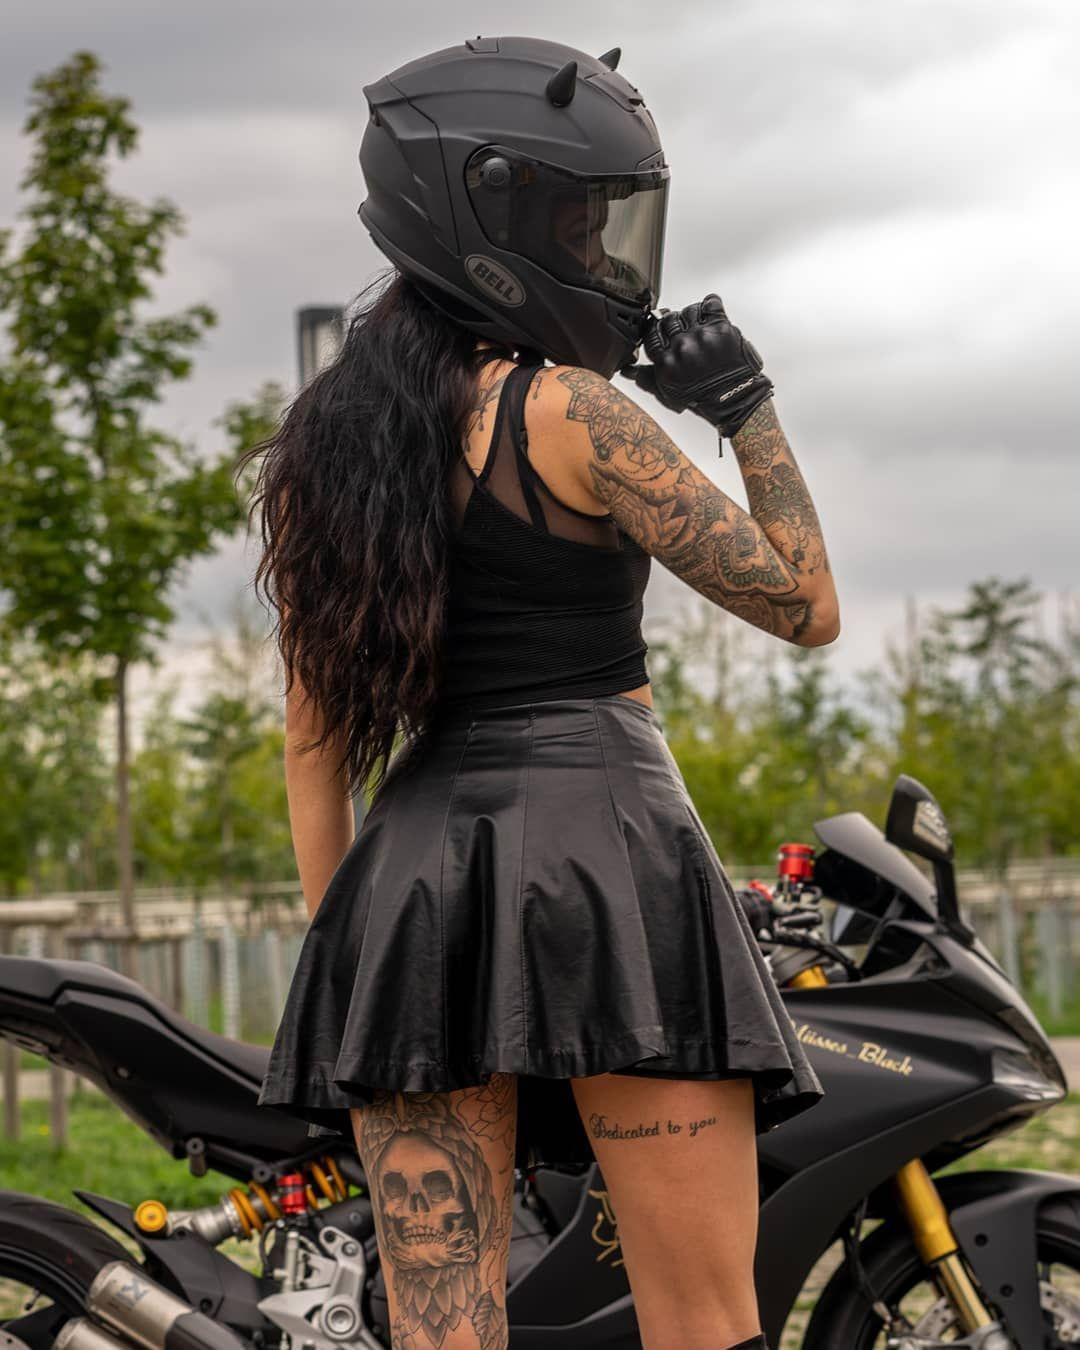 Harley Riders serwis randkowy